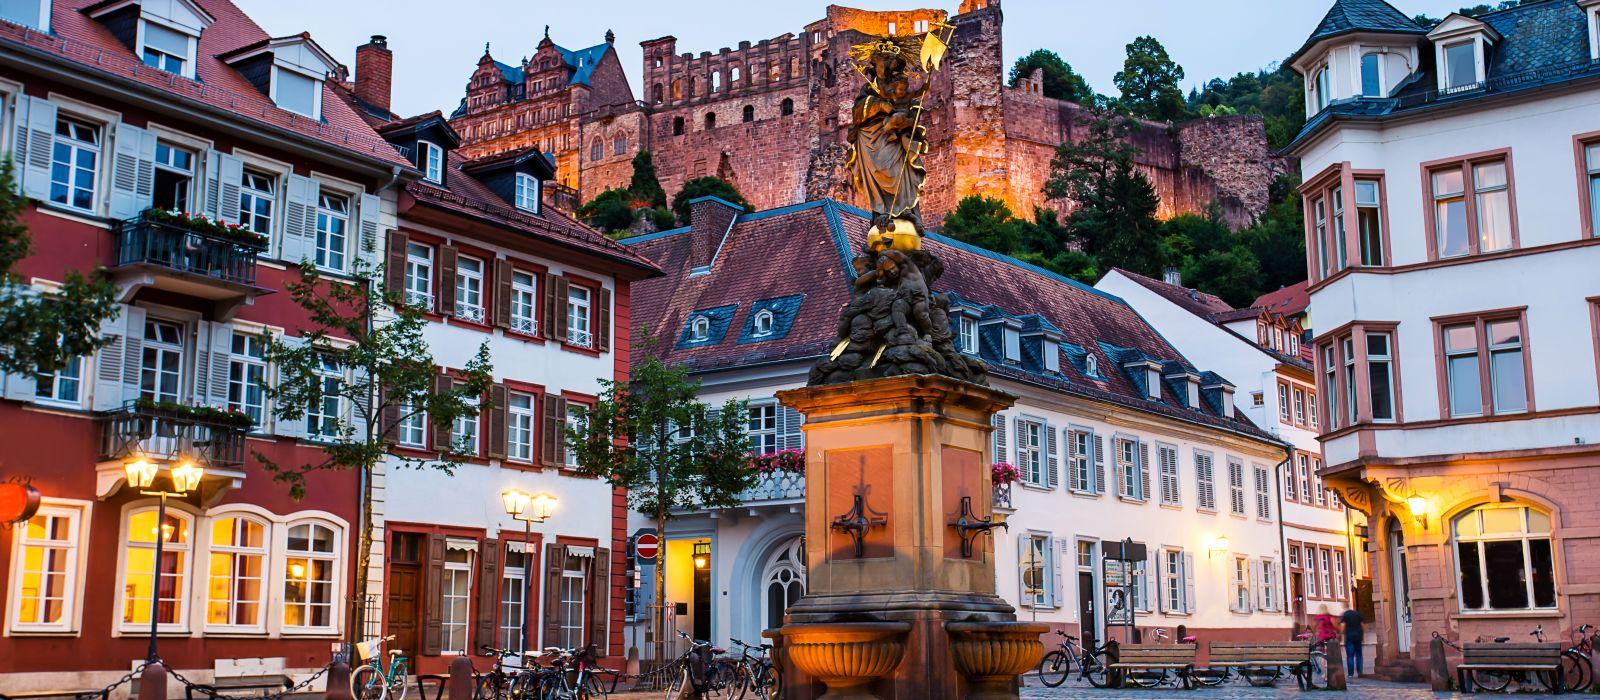 Hotel Europäischer Hof Heidelberg Germany